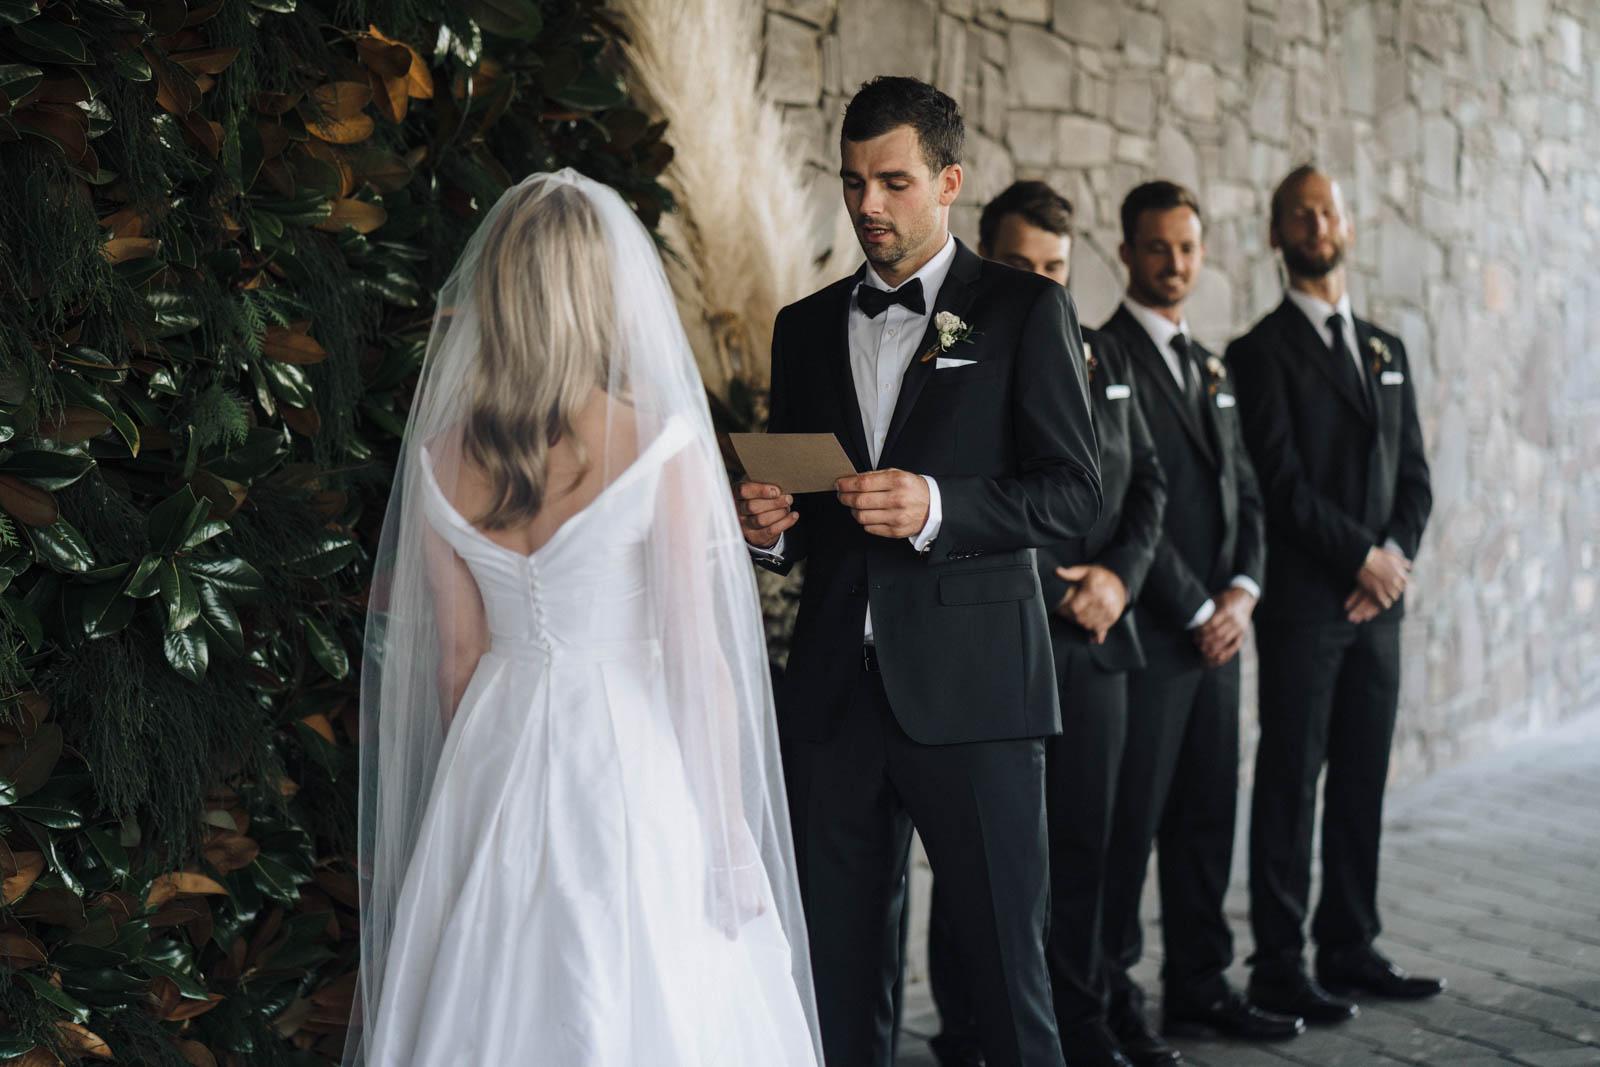 newfound-s-p-mt-maunganui-tauranga-wedding-photographer-1707-LQ100165